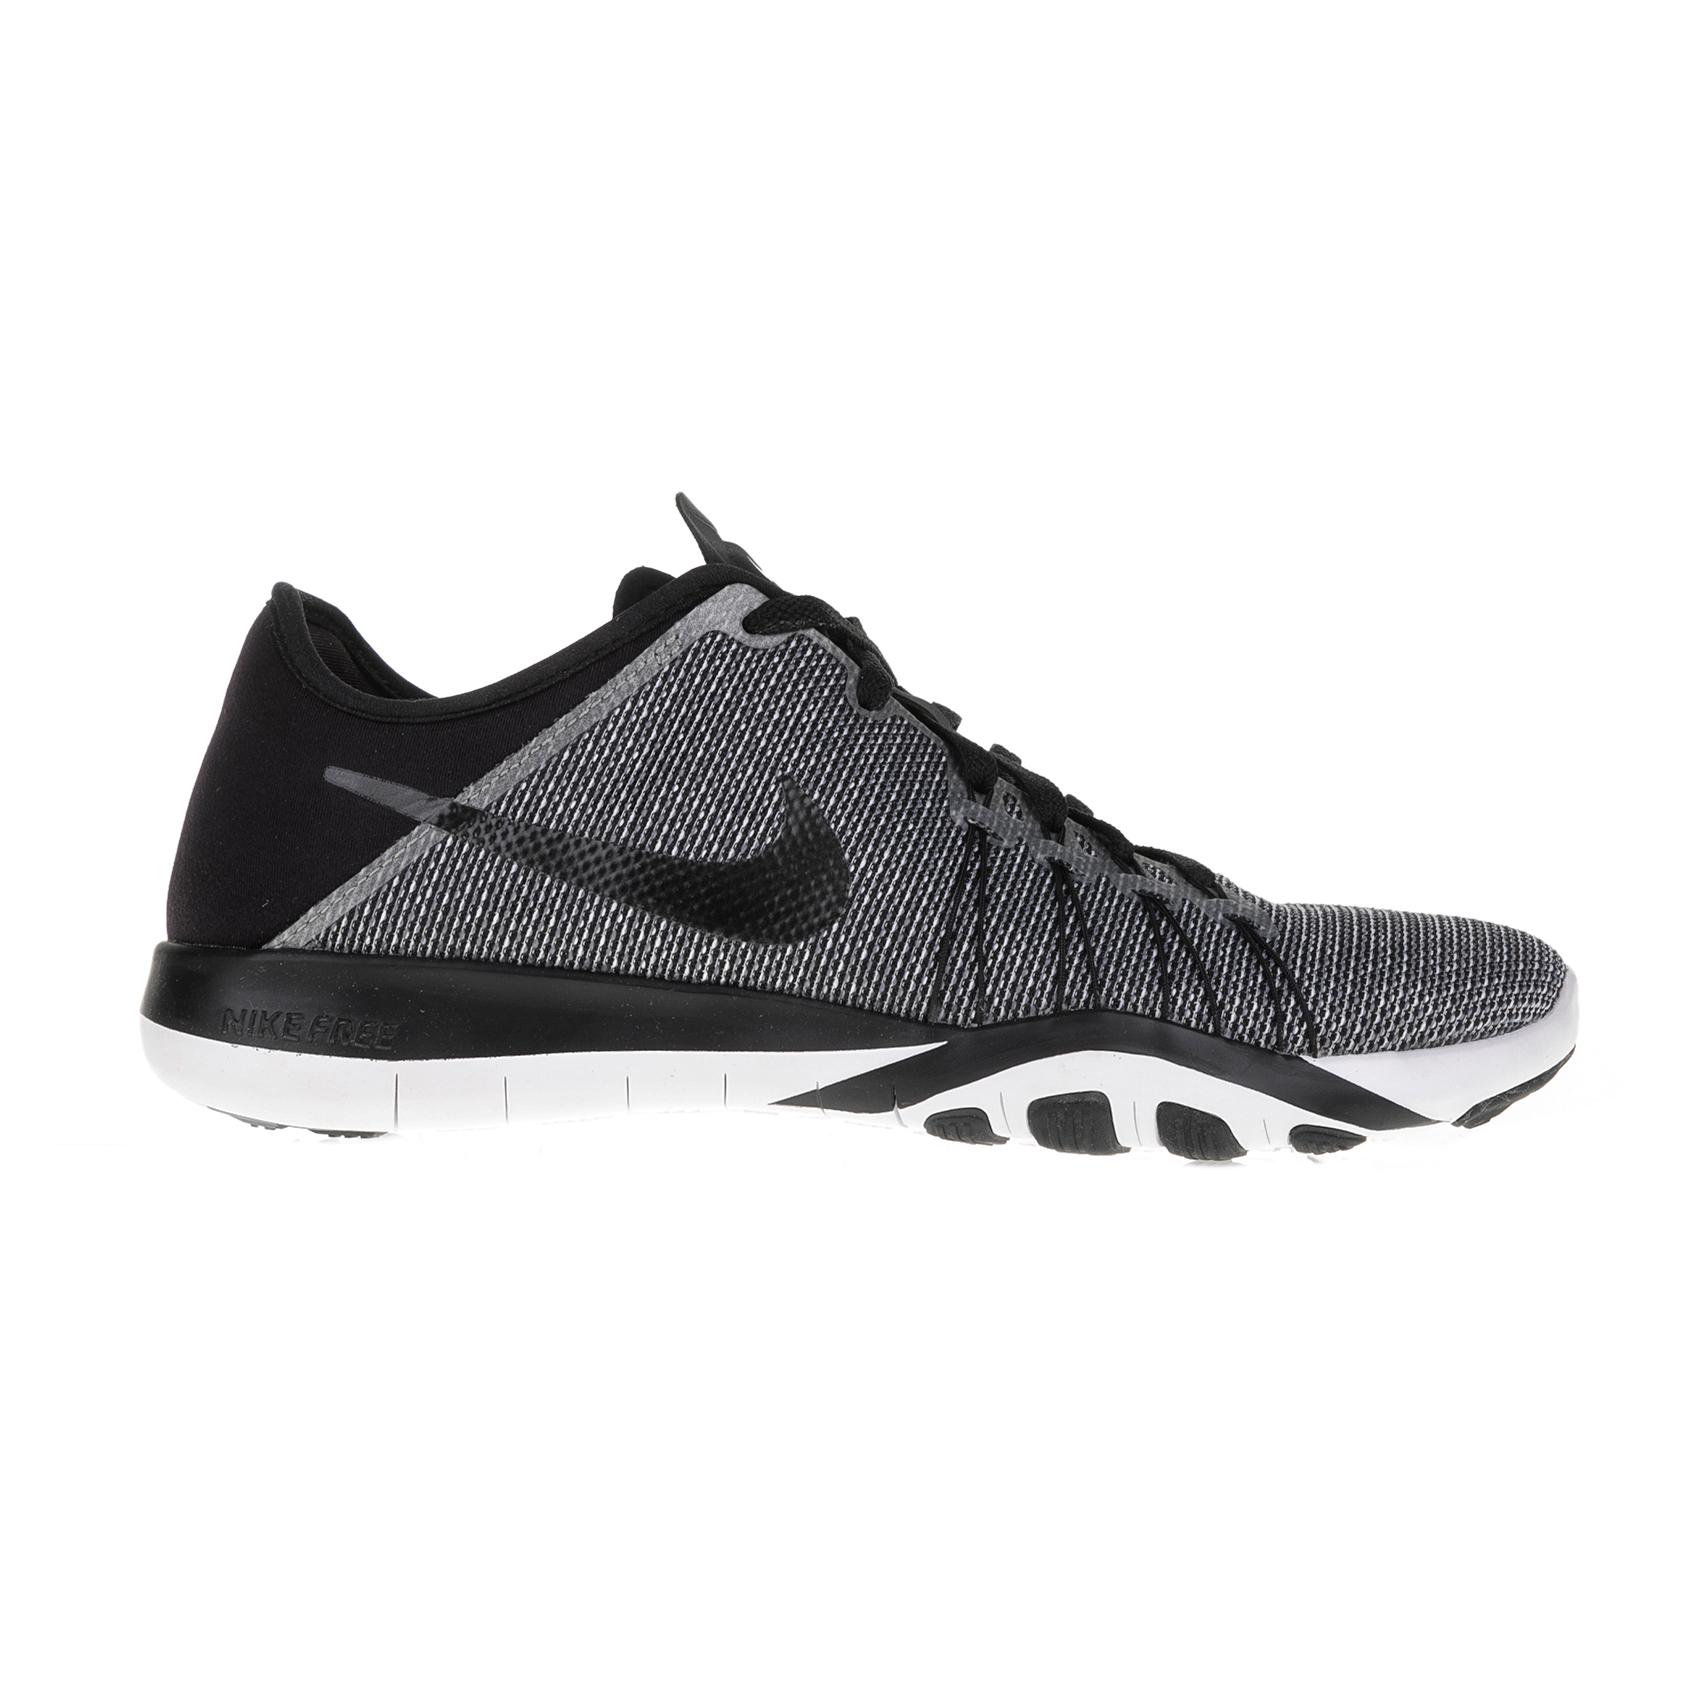 1d5a763124f NIKE - Γυναικεία αθλητικά παπούτσια Nike FREE TR 6 PRT μαύρα - γκρι ...